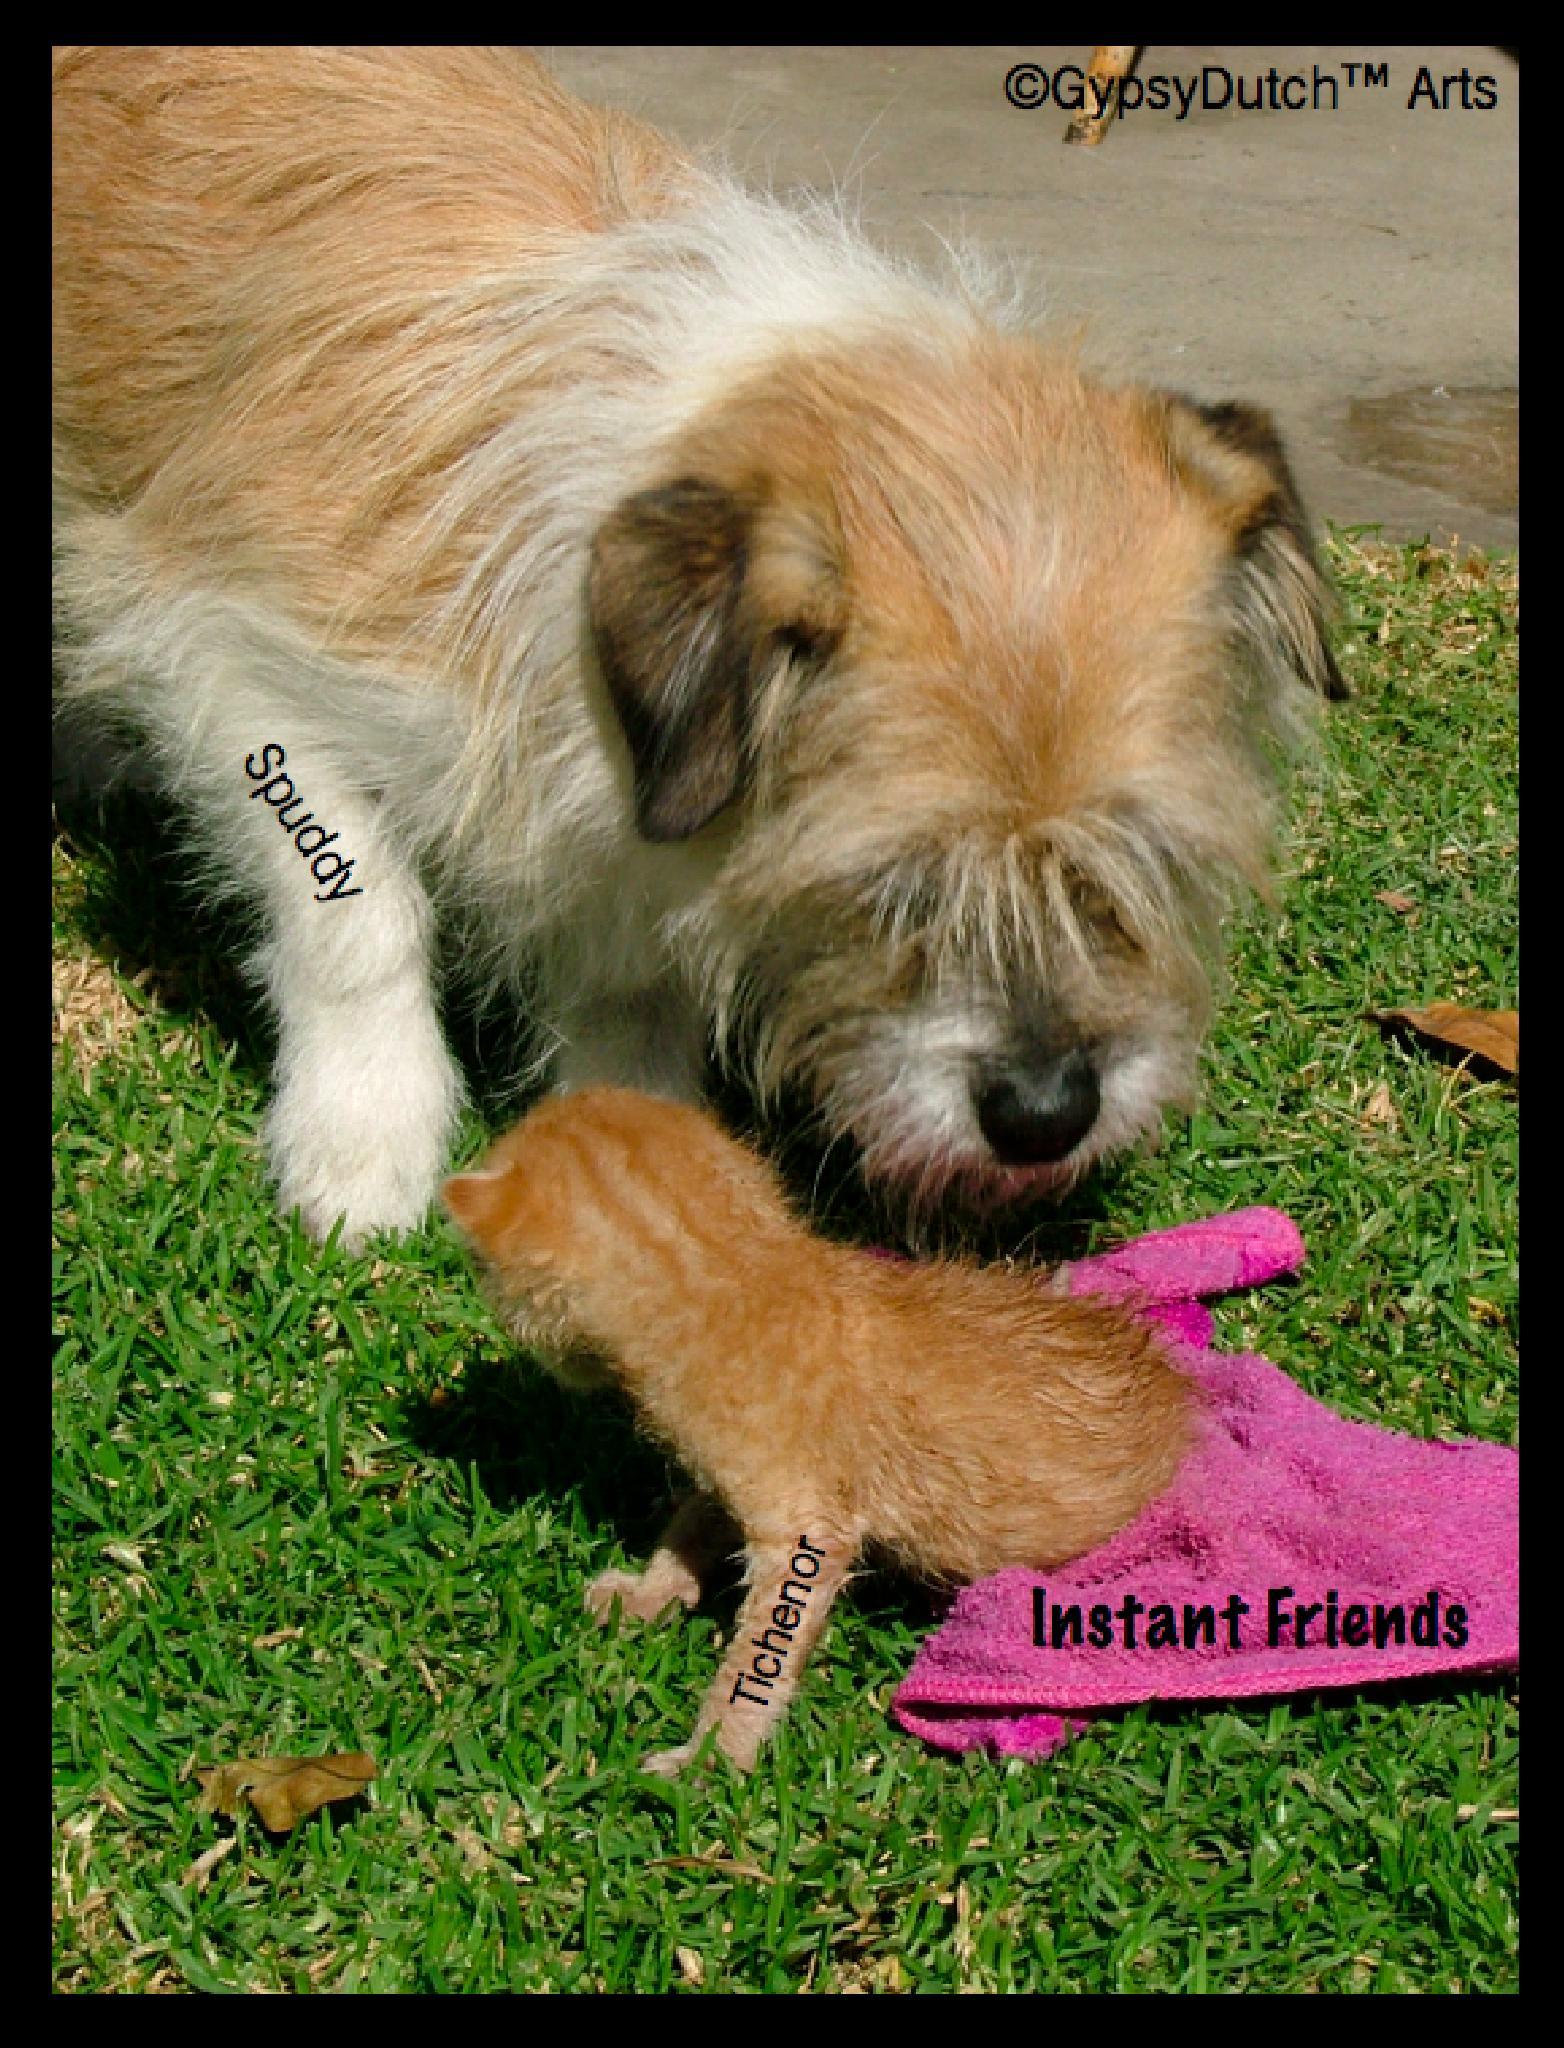 Instant Friends by GypsyDutch